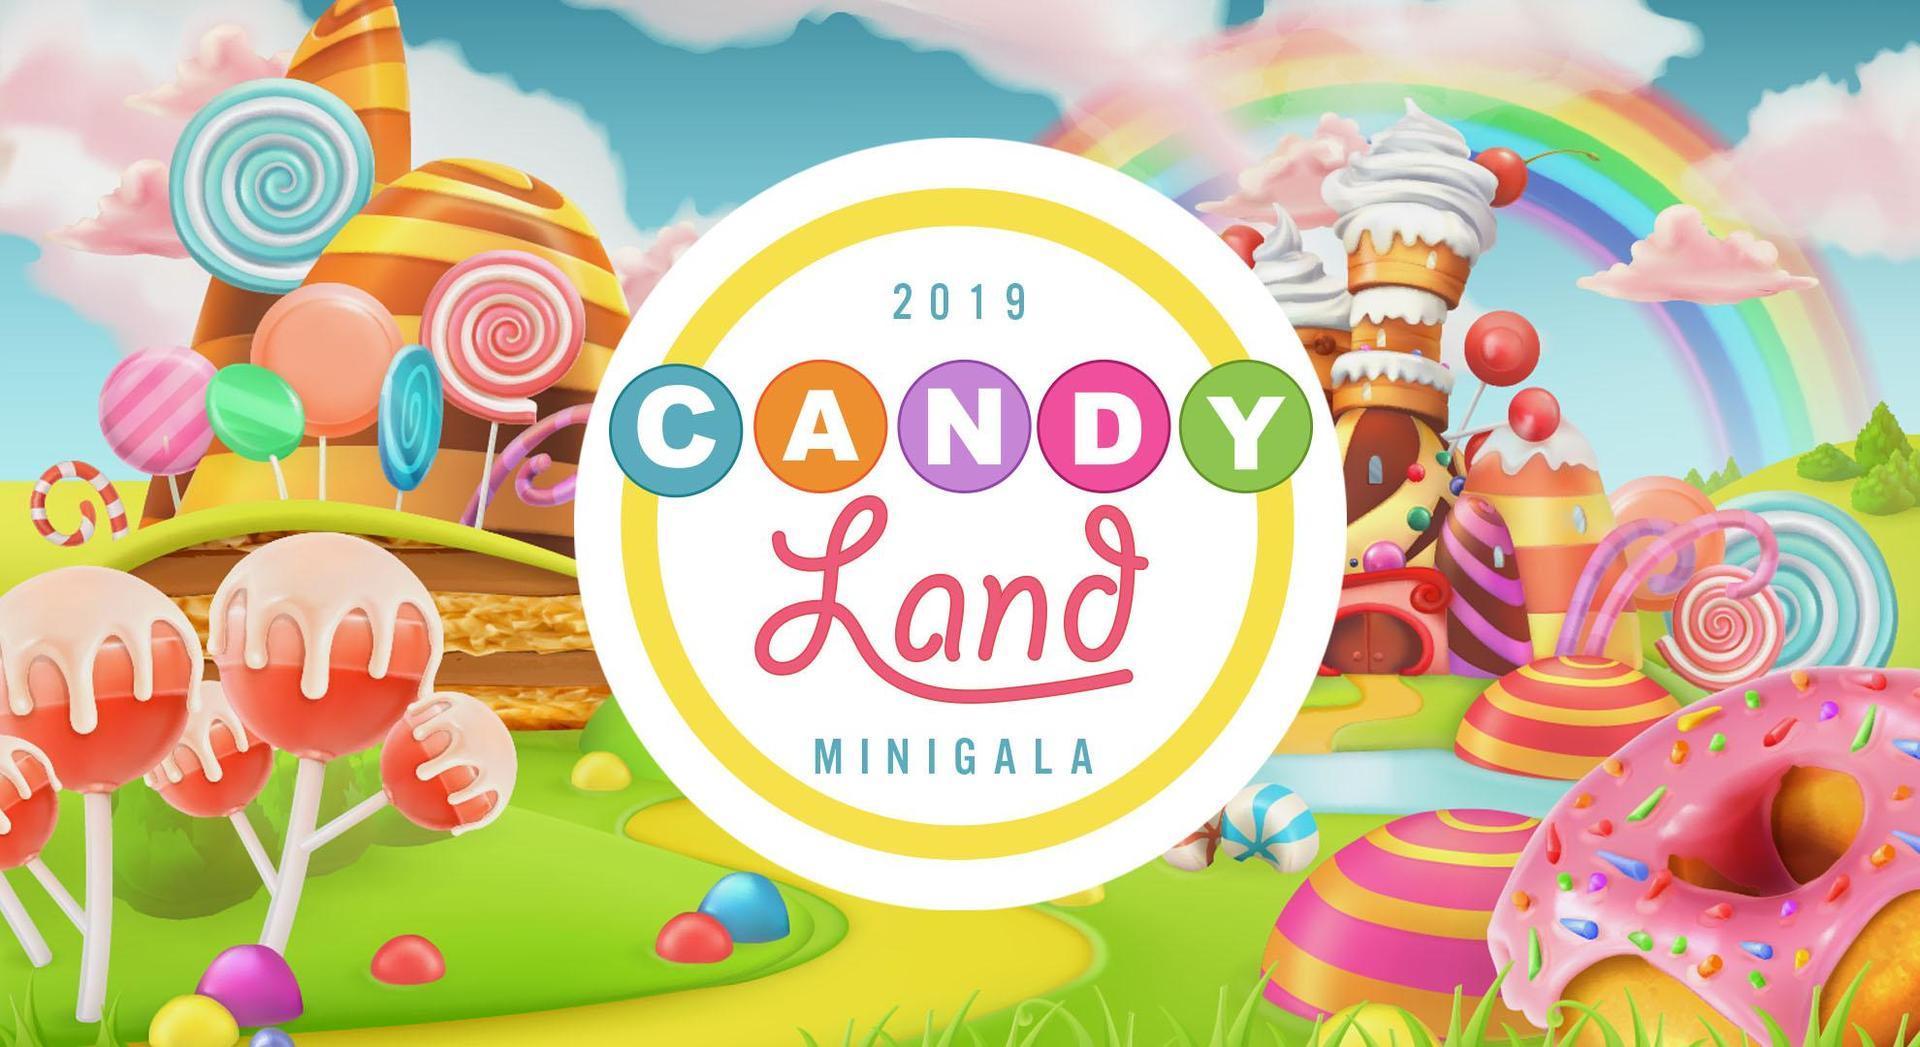 candyland image with logo